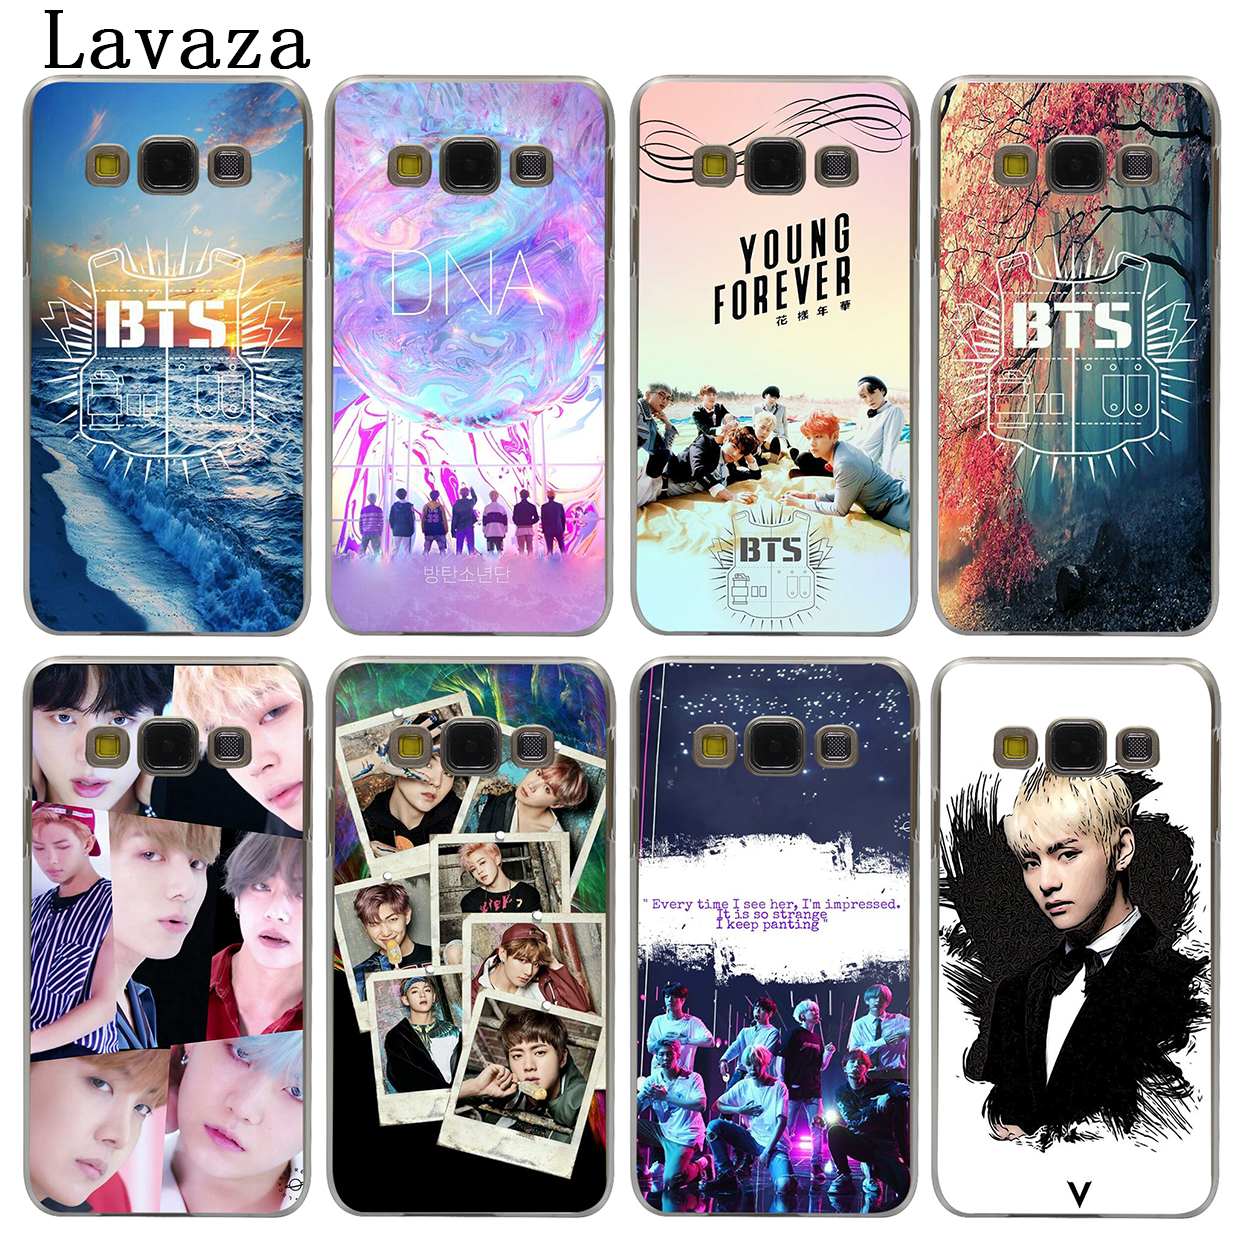 Lavaza BTS Bangtan Boys Hard Cover Case for Samsung Galaxy J7 J1 J2 J3 J5 2015 2016 2017 Prime Pro Ace 2018 Cases